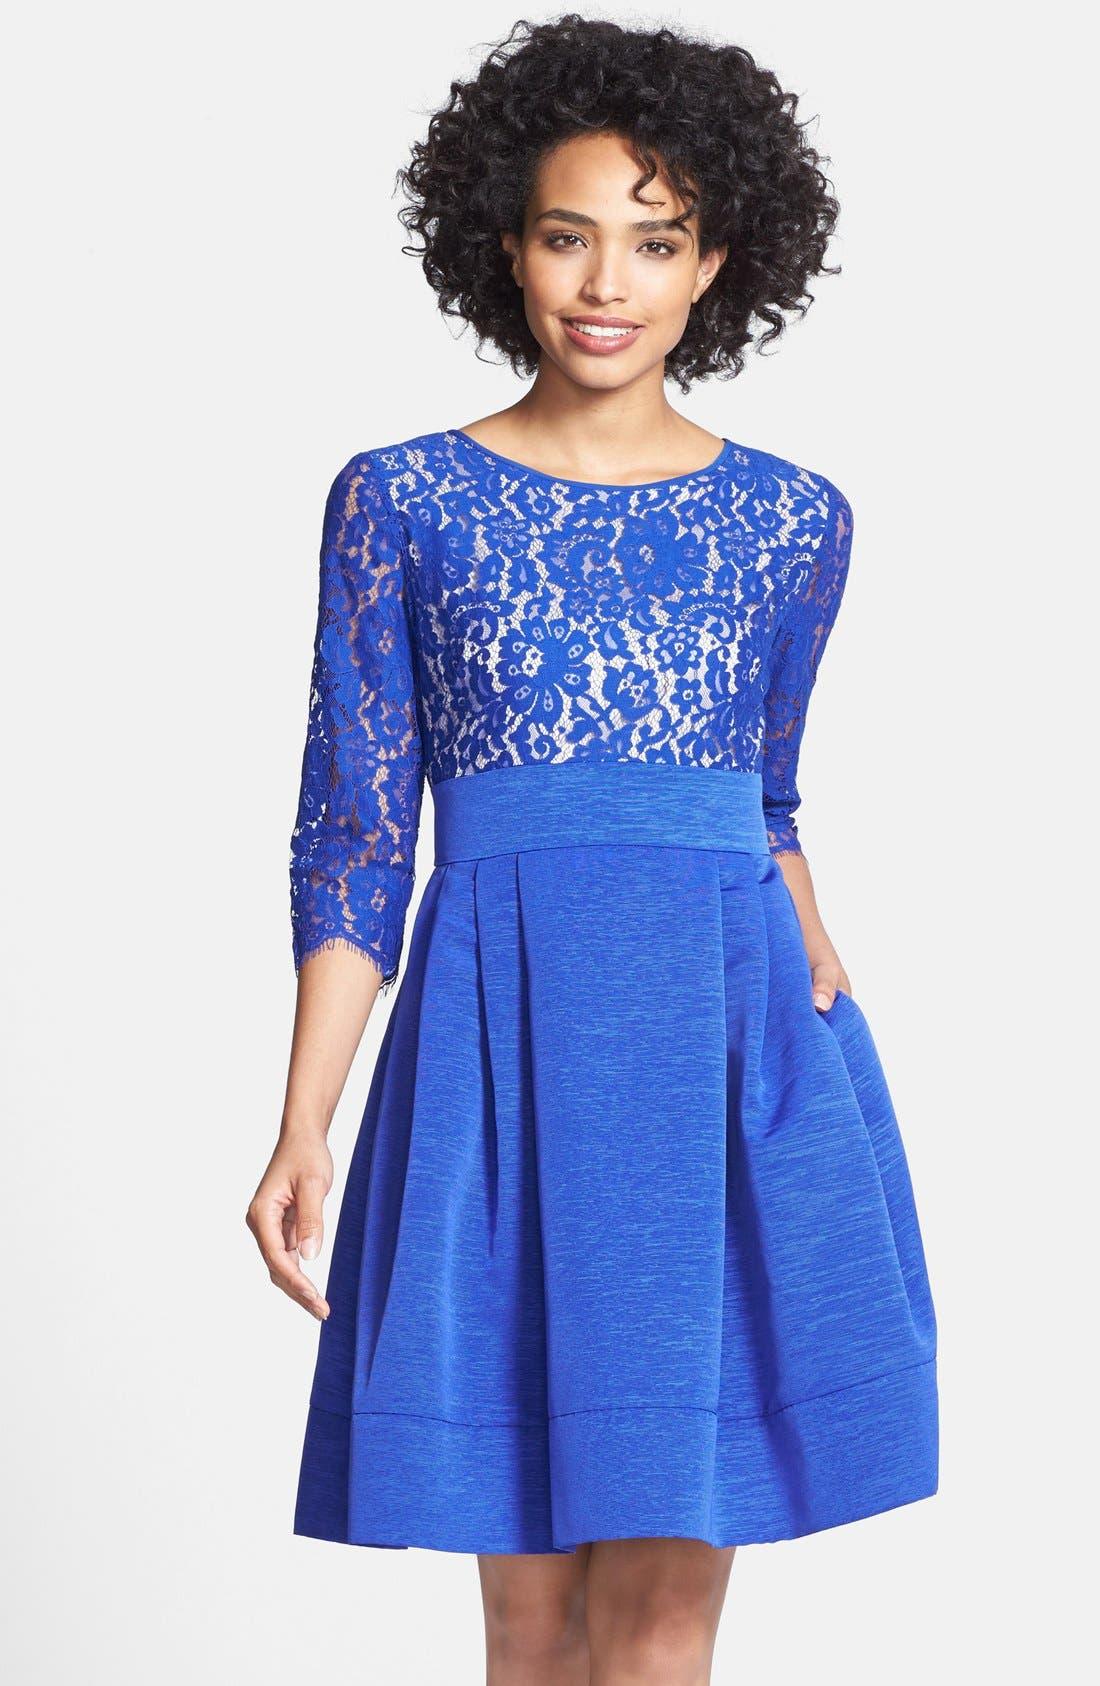 Alternate Image 1 Selected - Eliza J Lace & Faille Dress